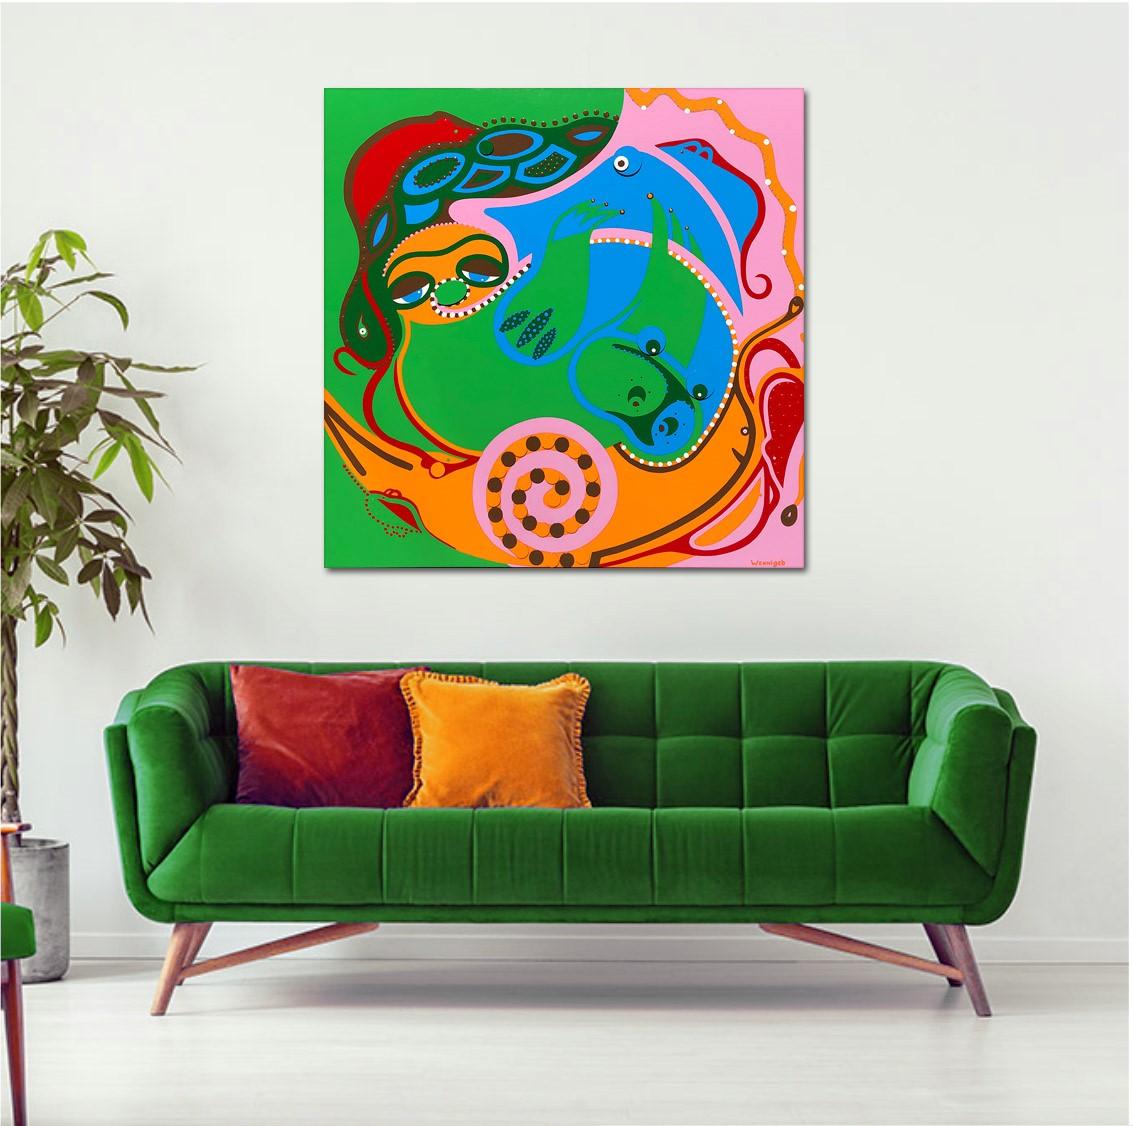 Wennigeb-Red-Livingroom-Rat-Race-Toyism-Art